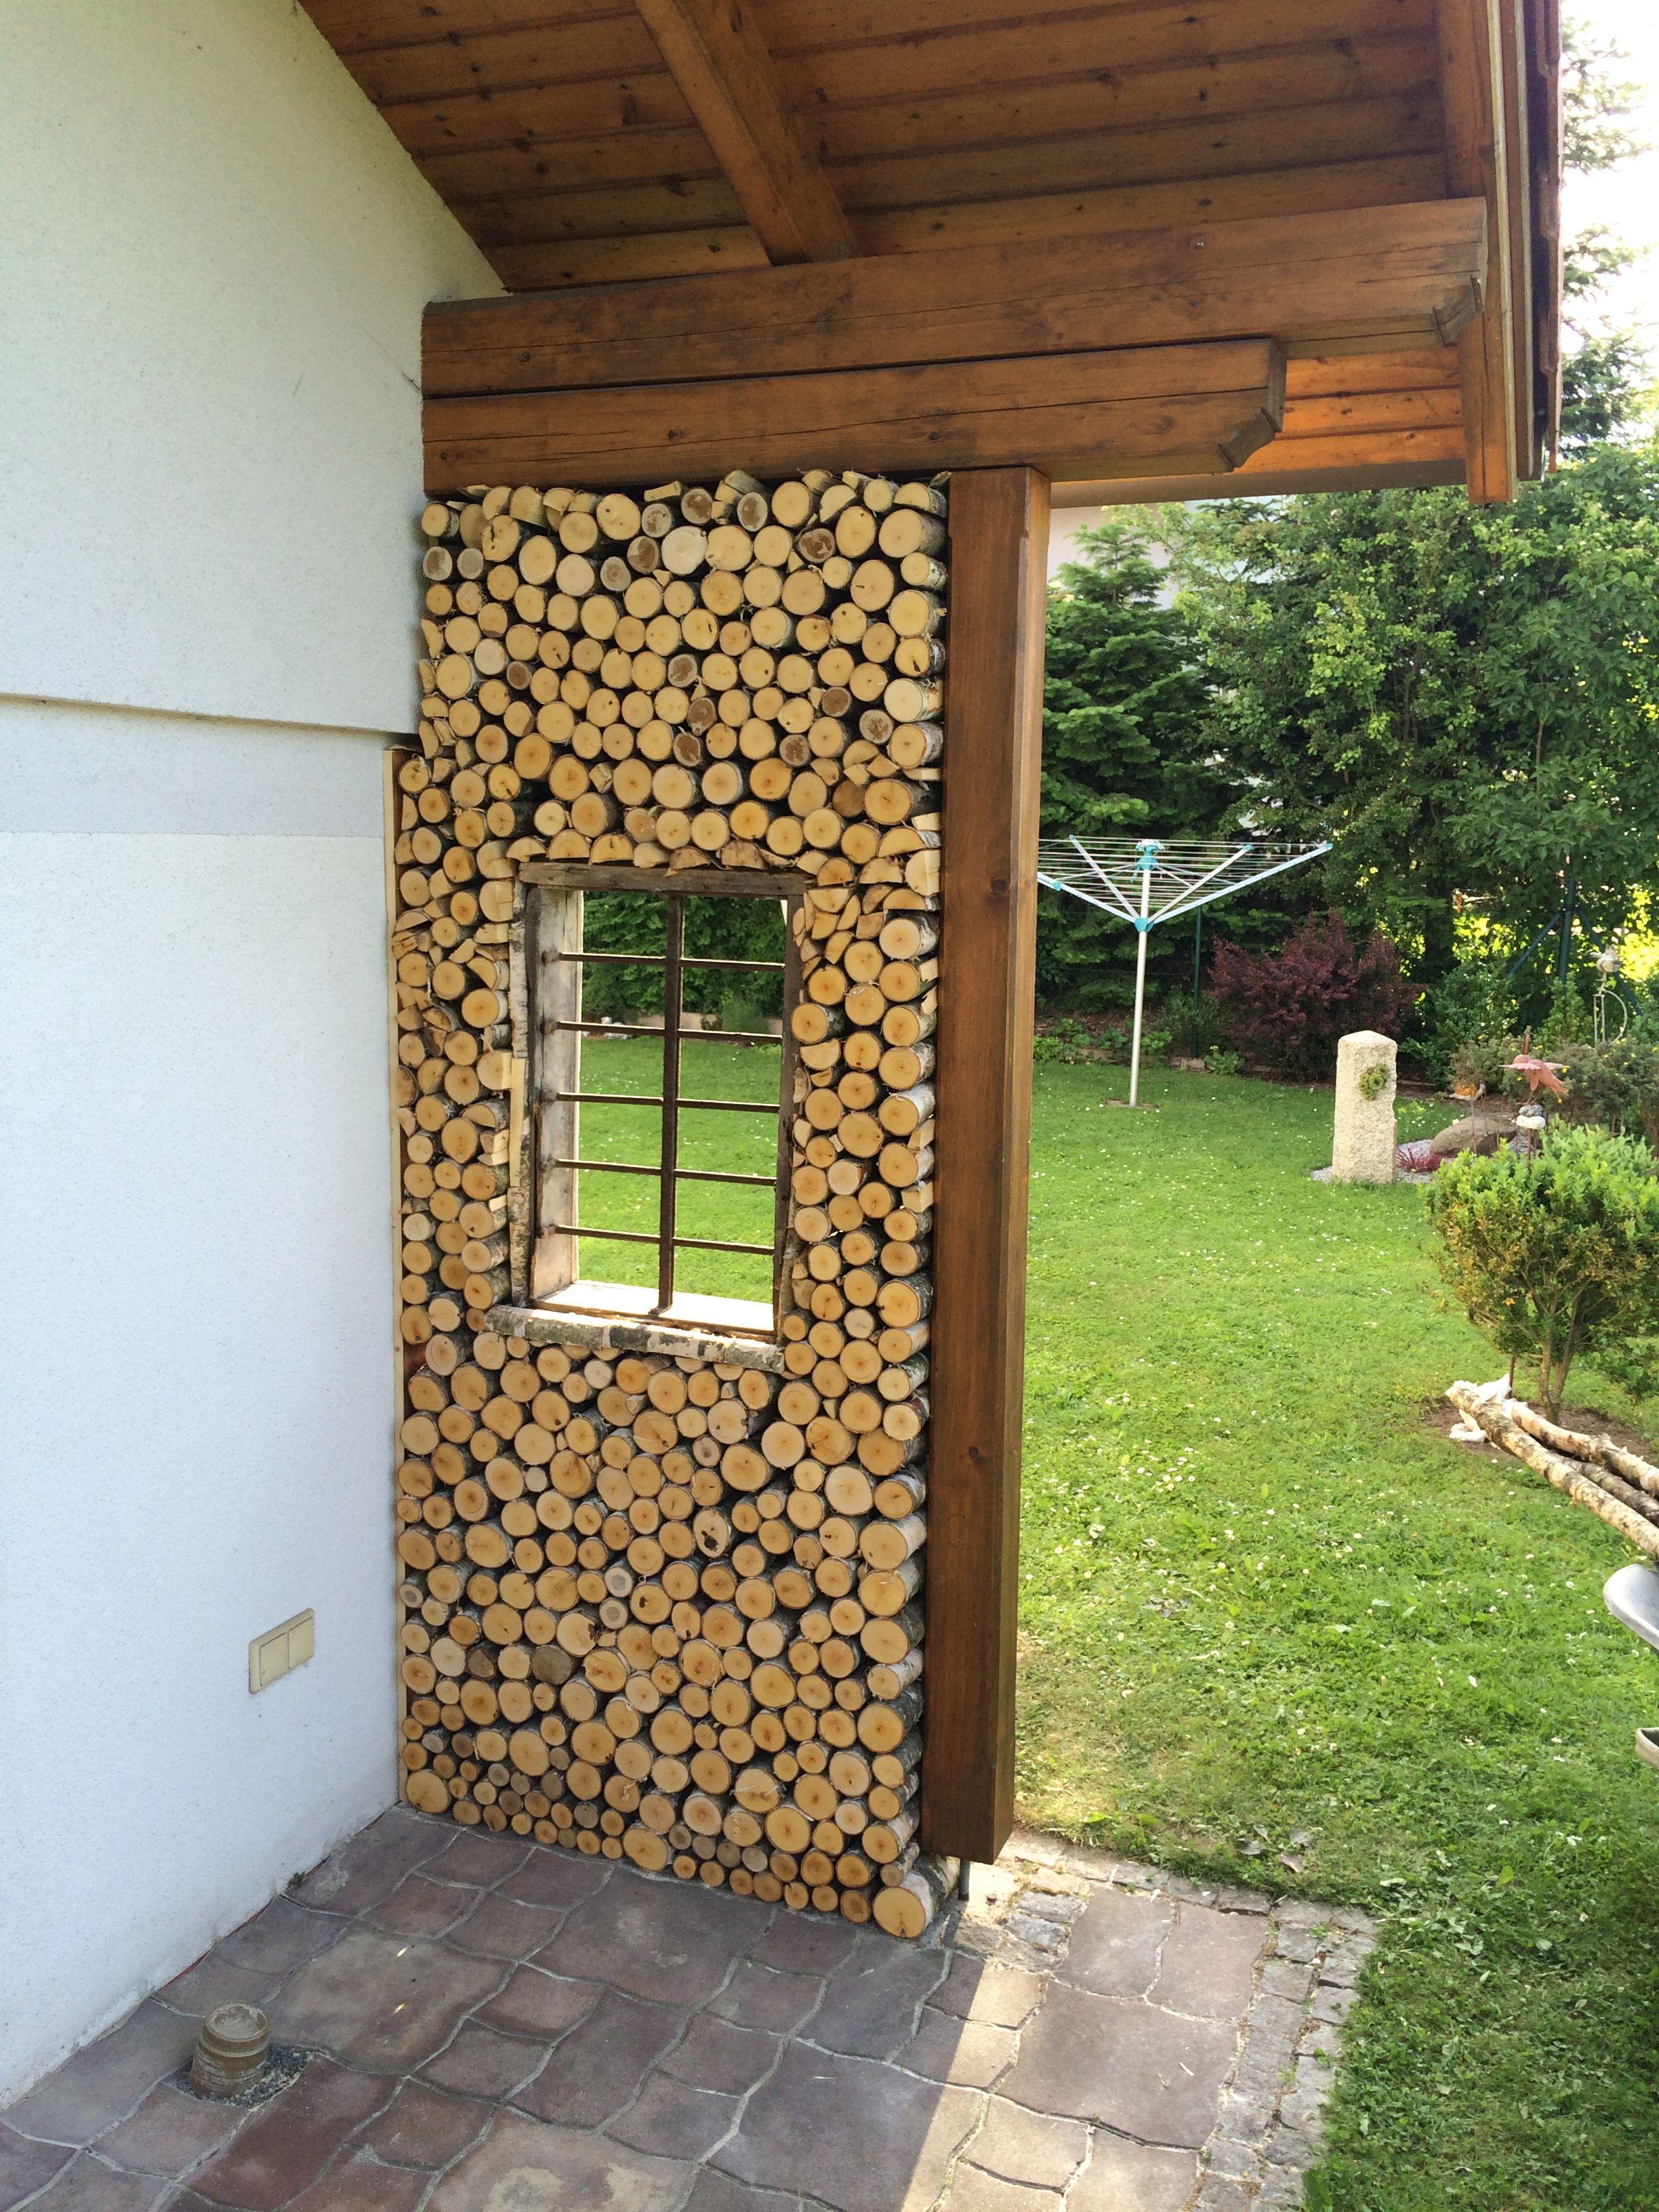 Fertige Wand Aus Birkenholz Dekorativ Im Garten Holzwand Garten